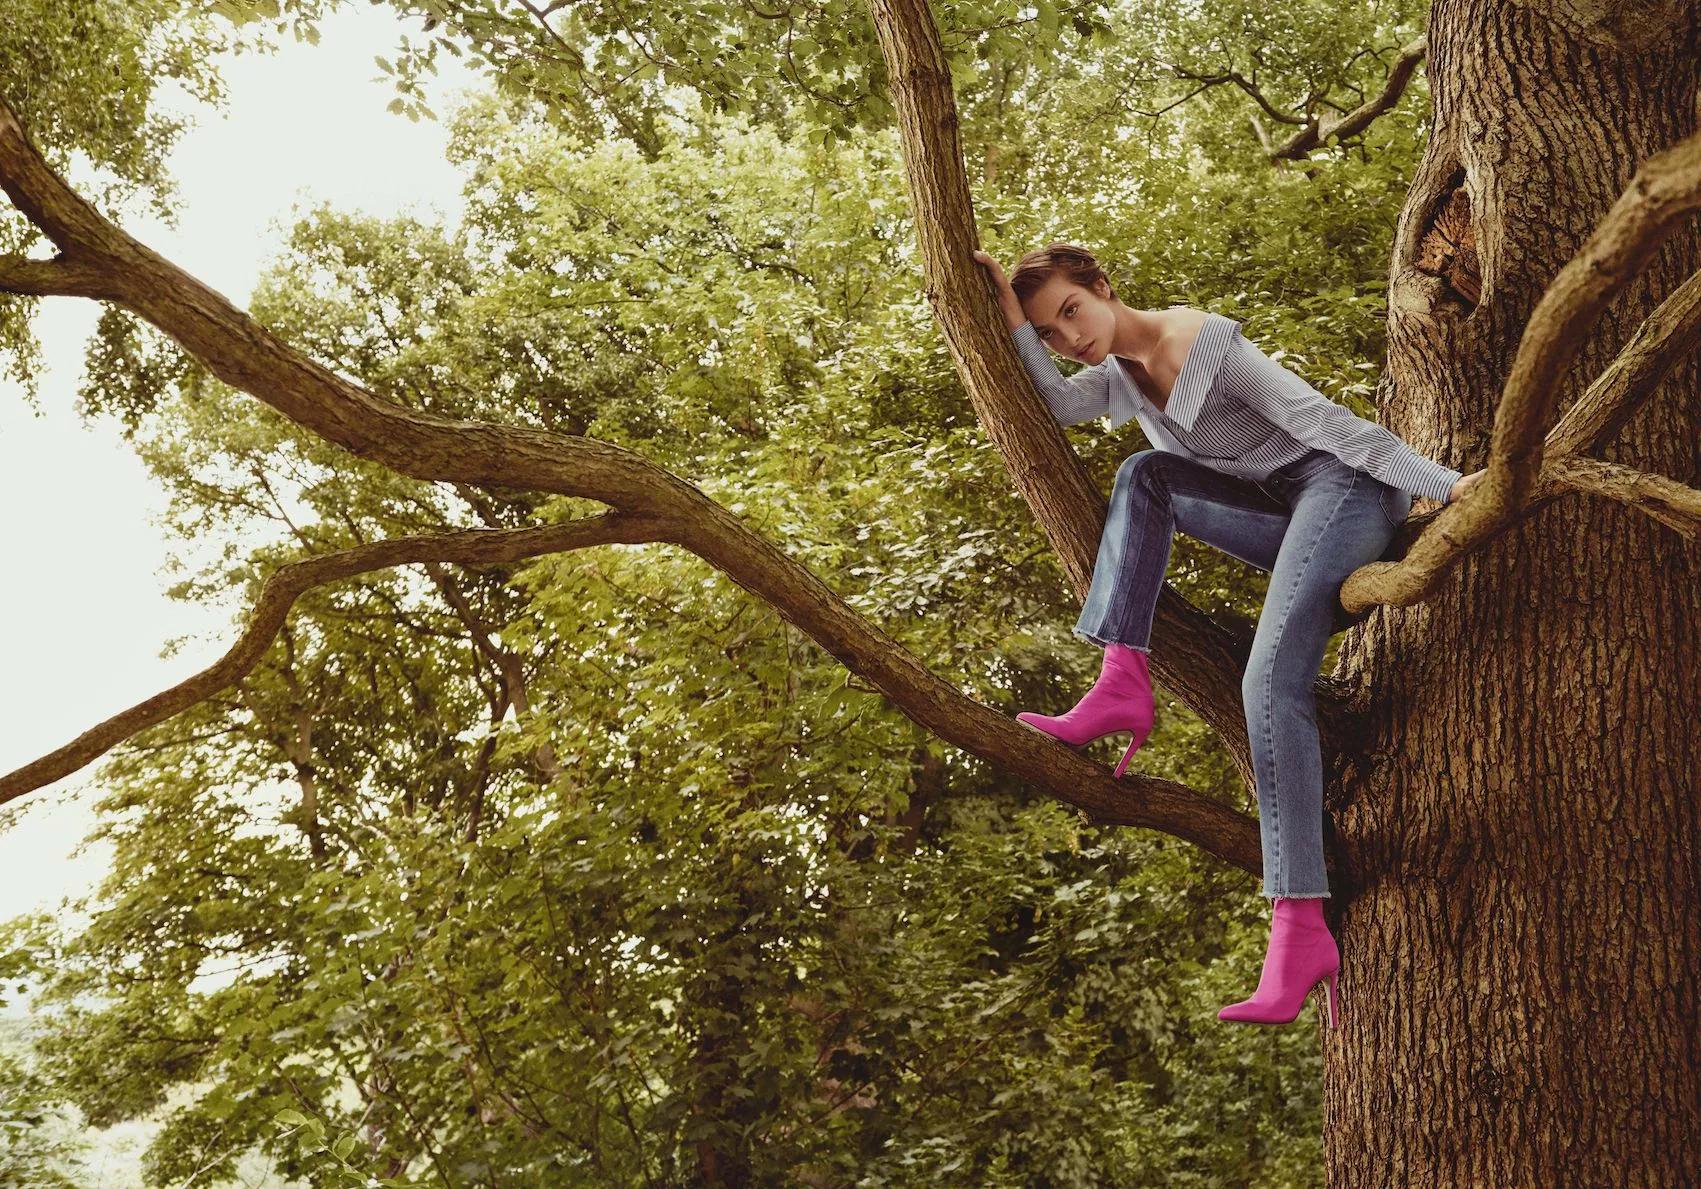 An actual Amazon fashion shoot